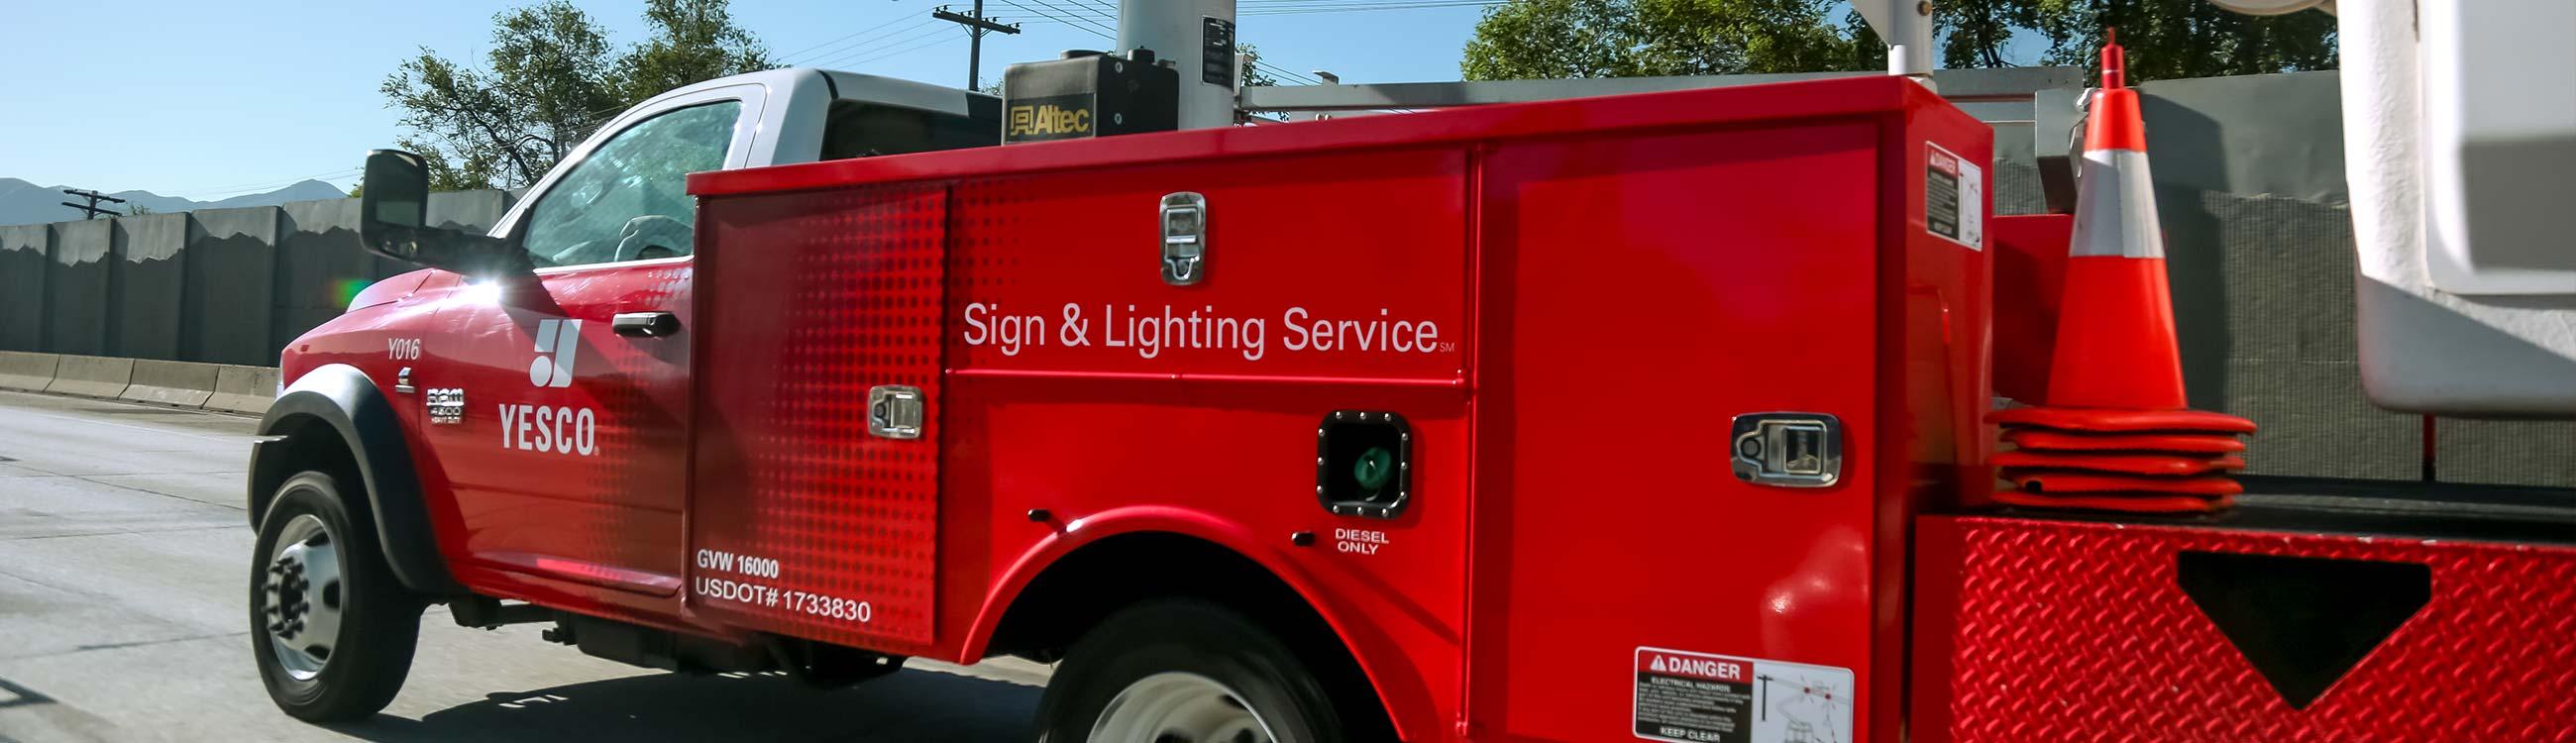 Lighting Service